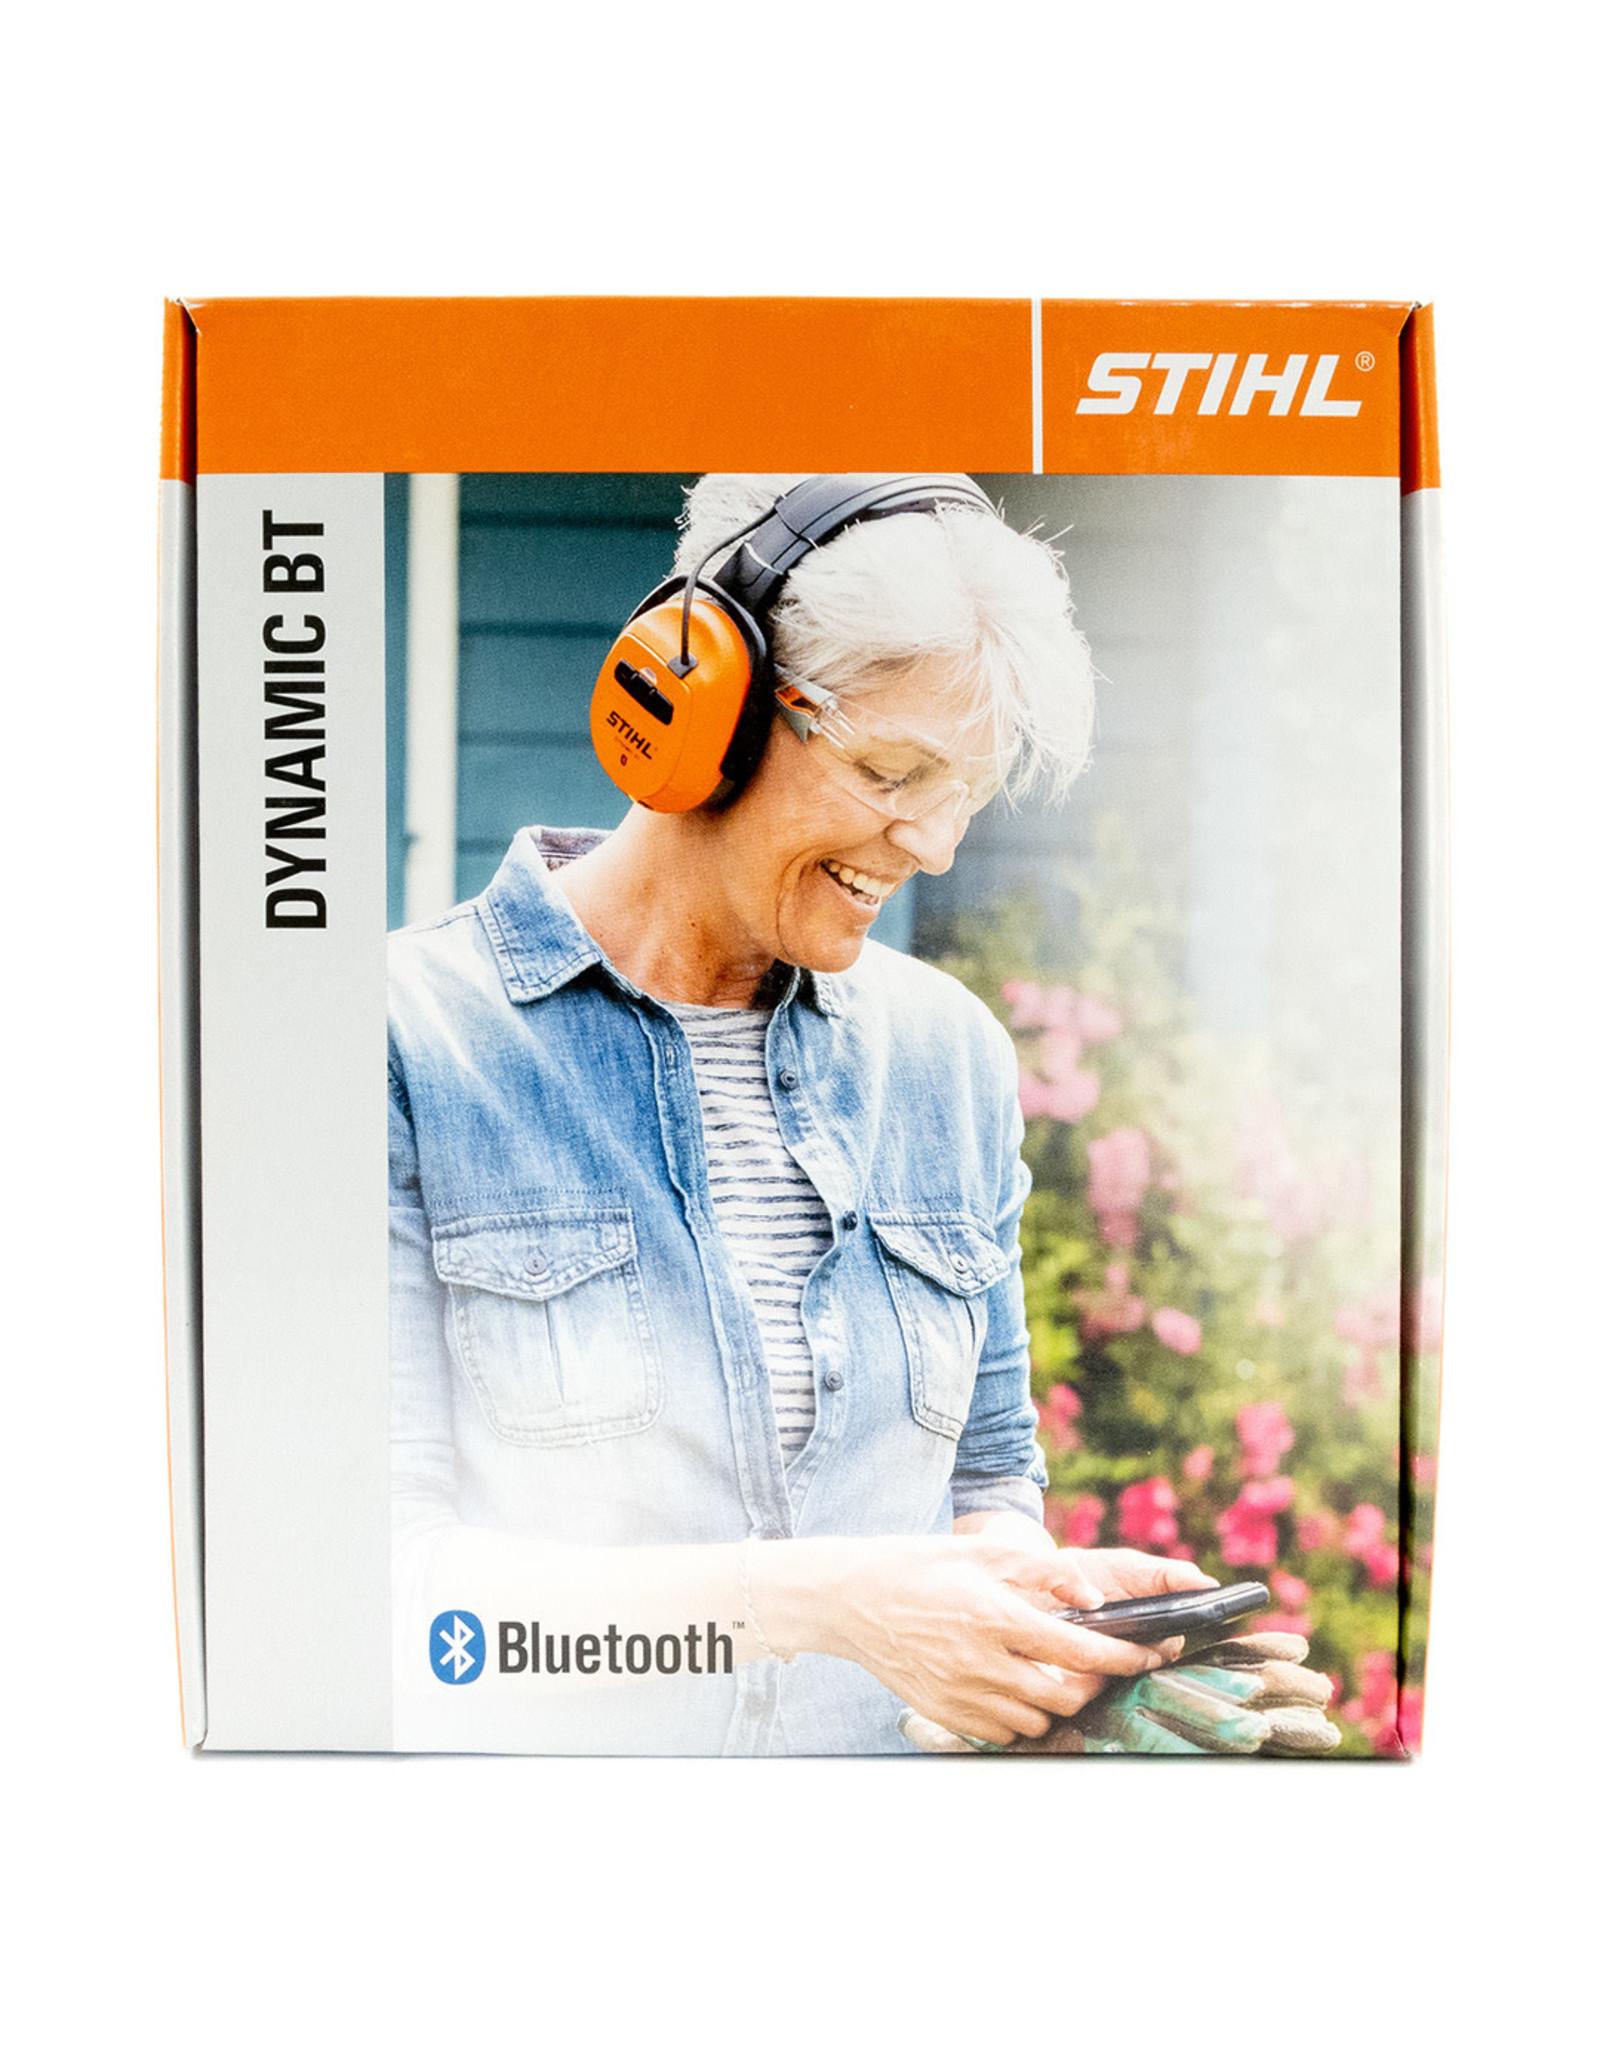 Stihl DYNAMIC BT HEARING PROTECTION